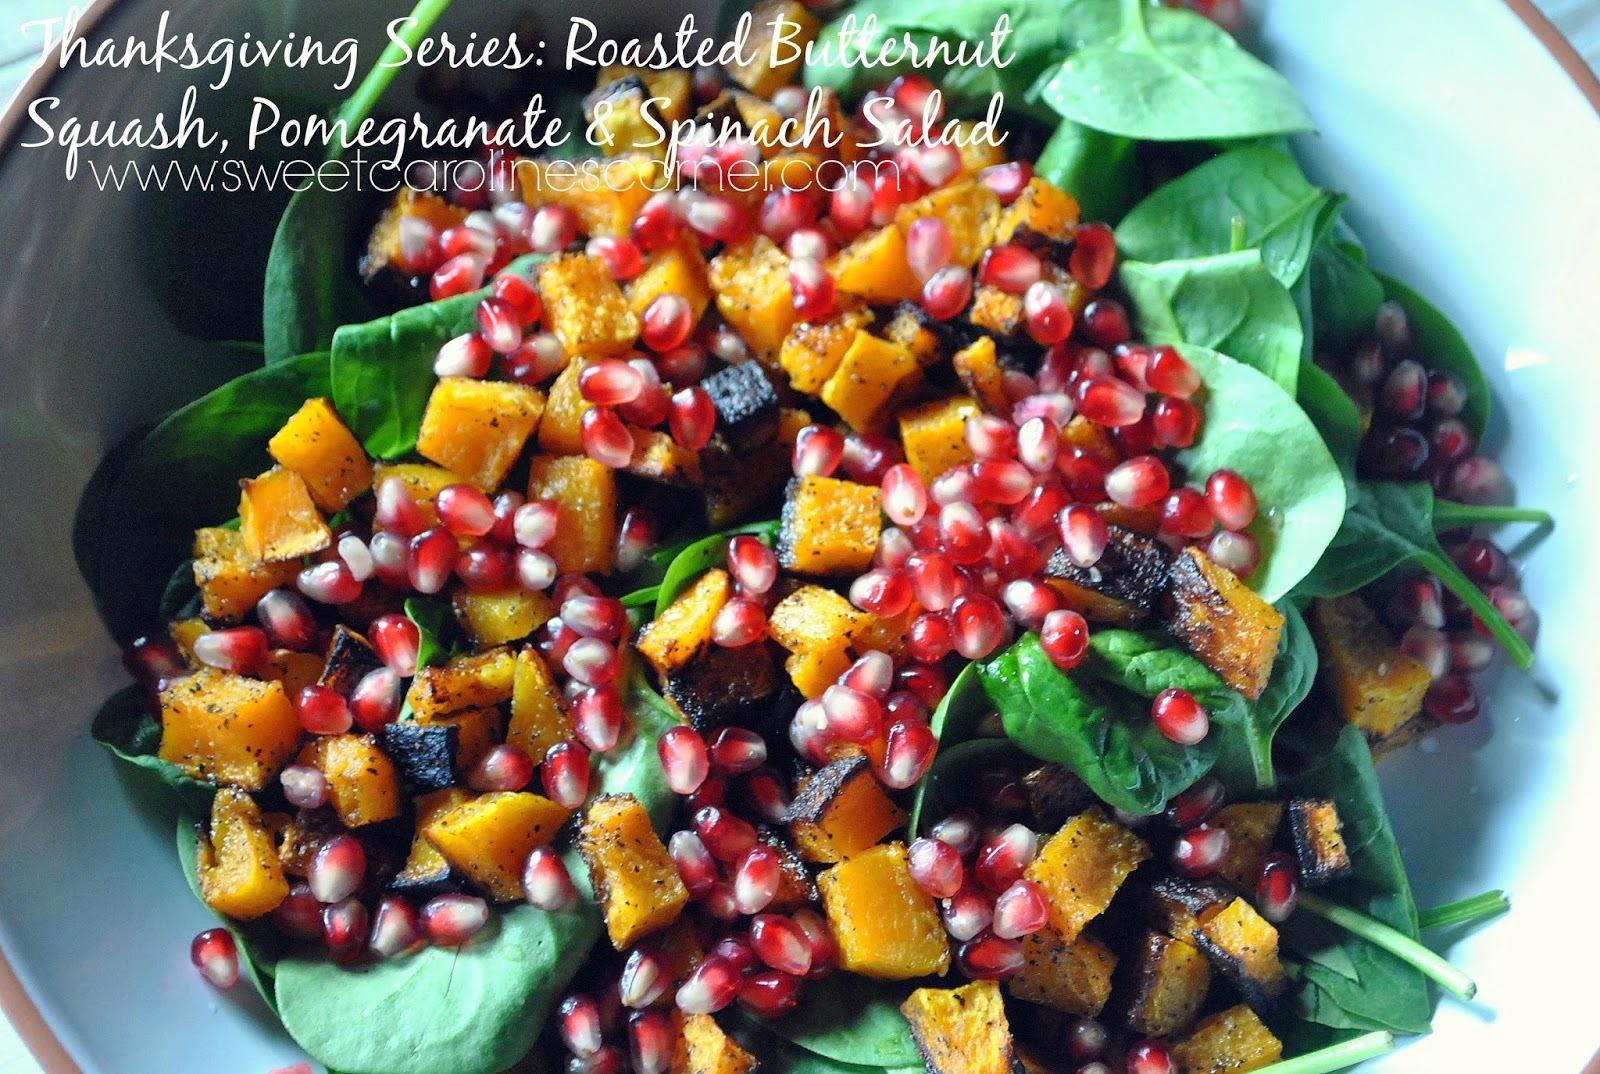 Thanksgiving Series: Roasted Butternut Squash, Pomegranate & Spinach Salad (Salada de Abóbora Assada, Romã & Espinafre)